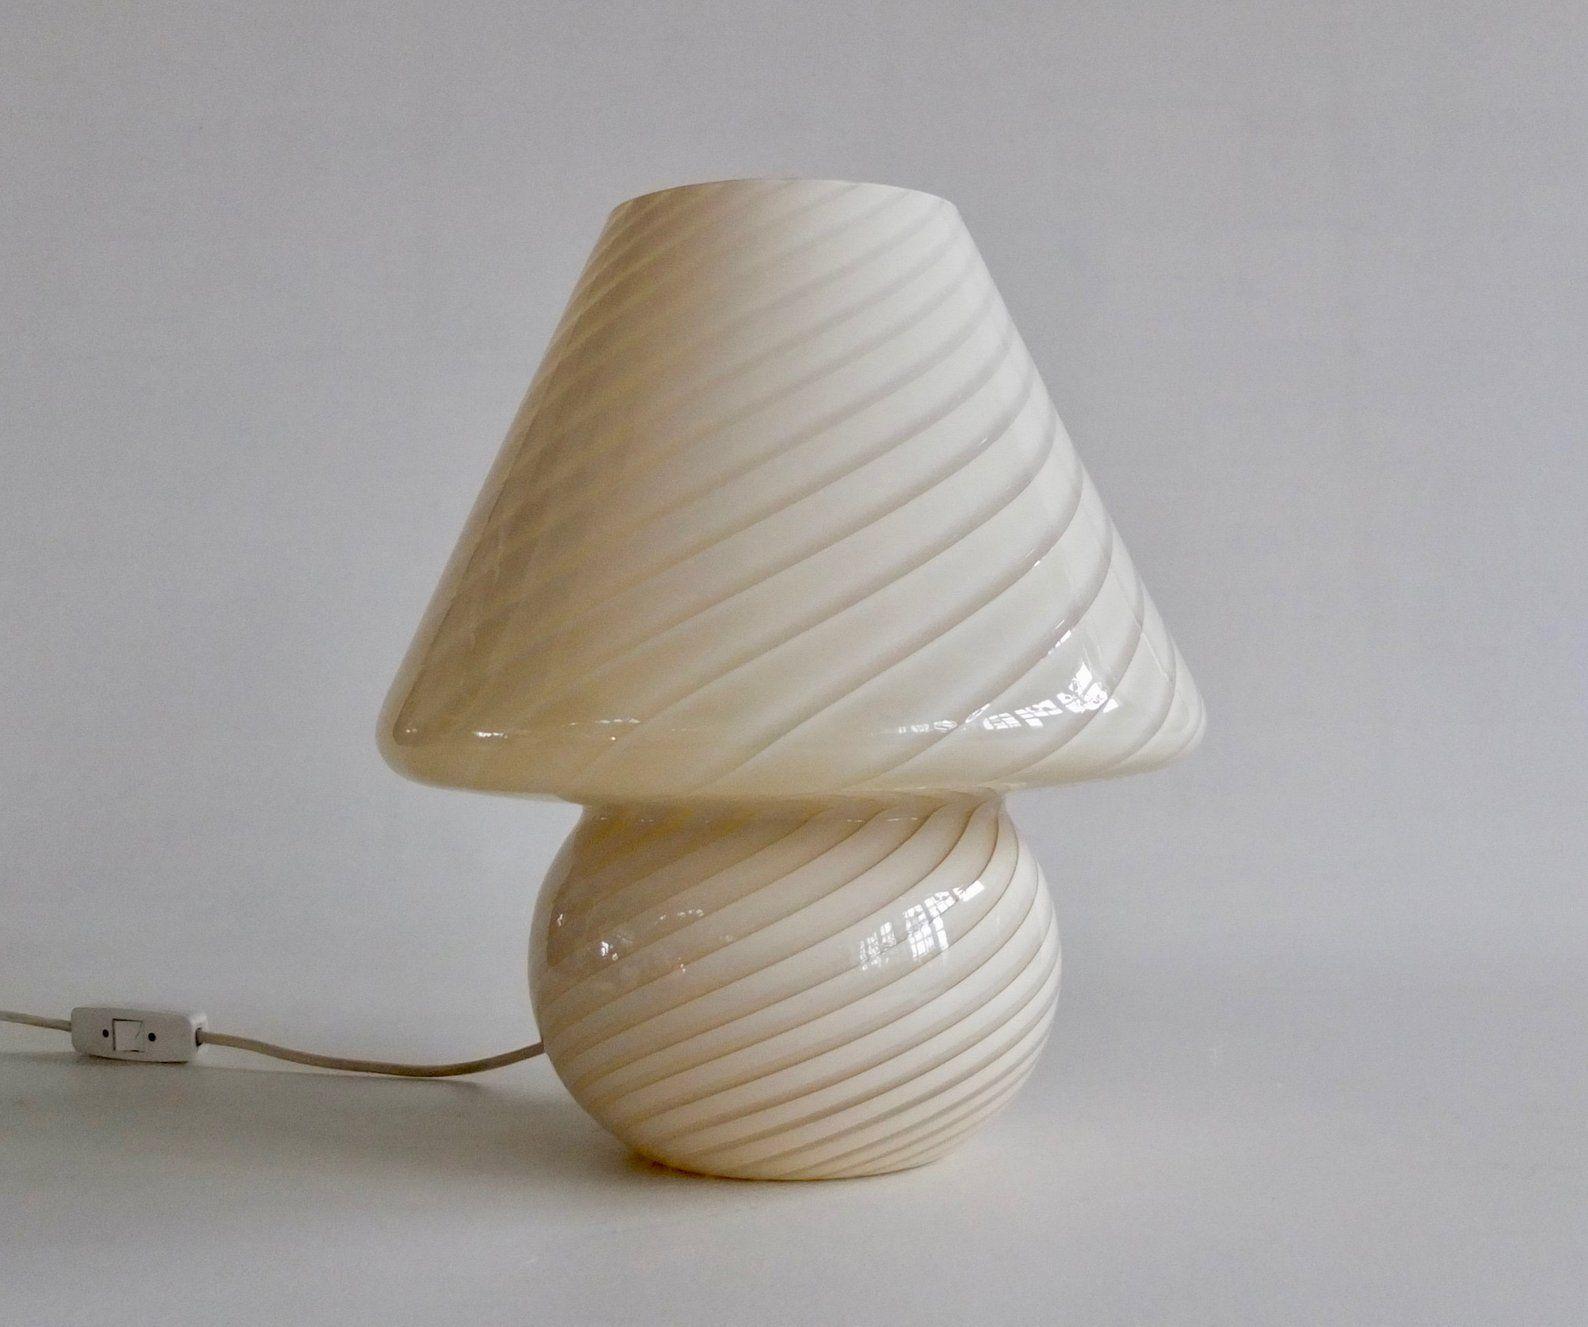 Xl Vintage Murano Swirl Glass Mushroom Table Lamp Beige Striped Glass 70s Italy Glass Mushrooms Lamp Tattoo Lamp